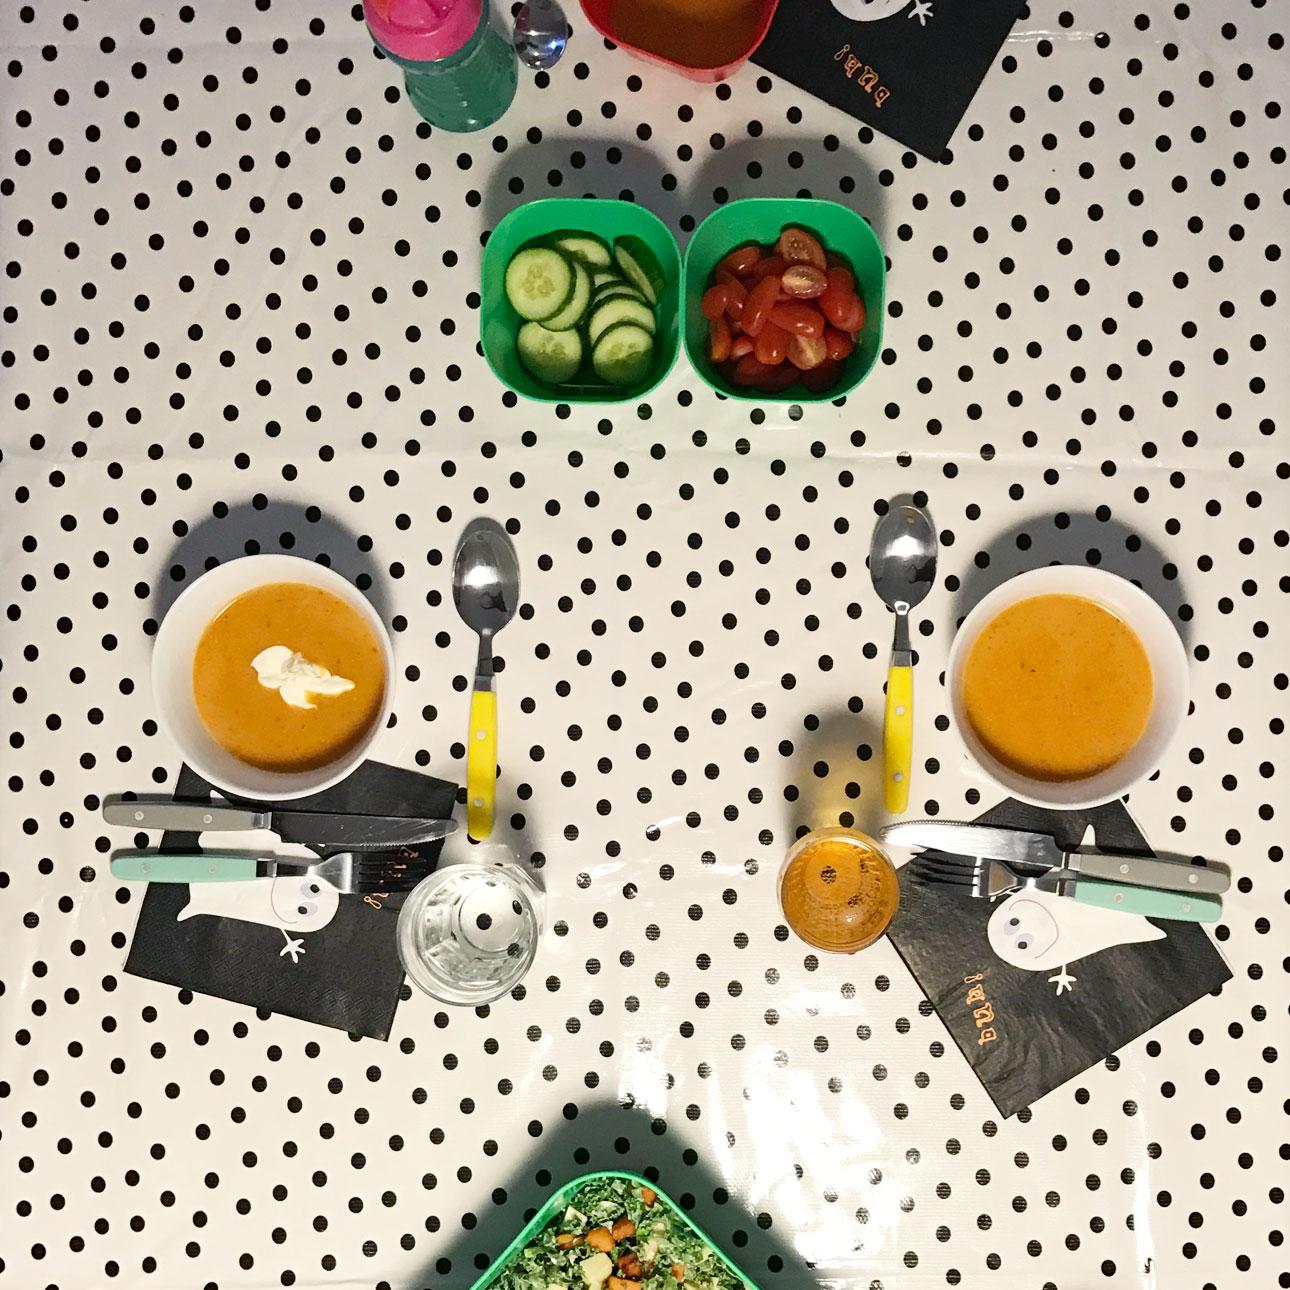 mamalifestyle-oktober-2016-tafel